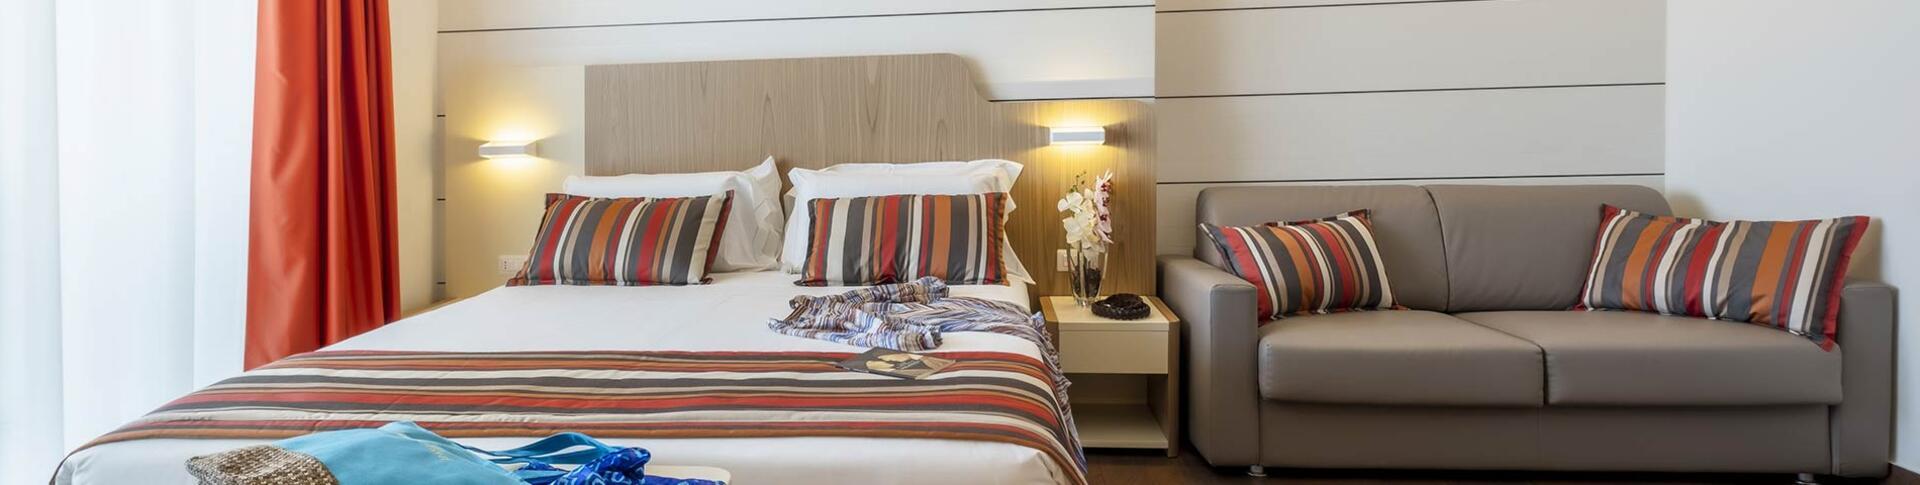 ariahotel en junior-suite 015